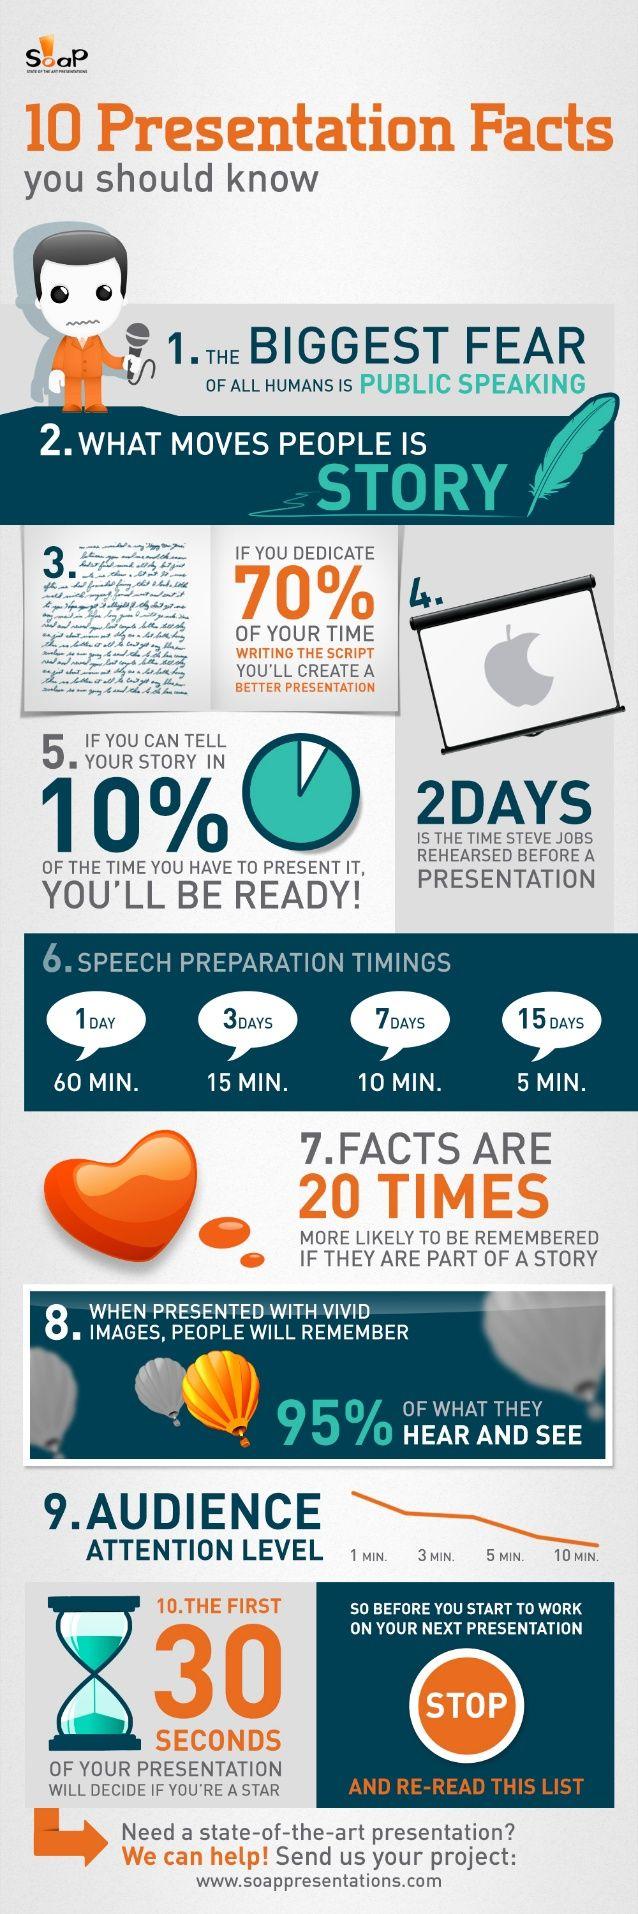 10 Presentation Facts You Should Know by soappresentations via slideshare